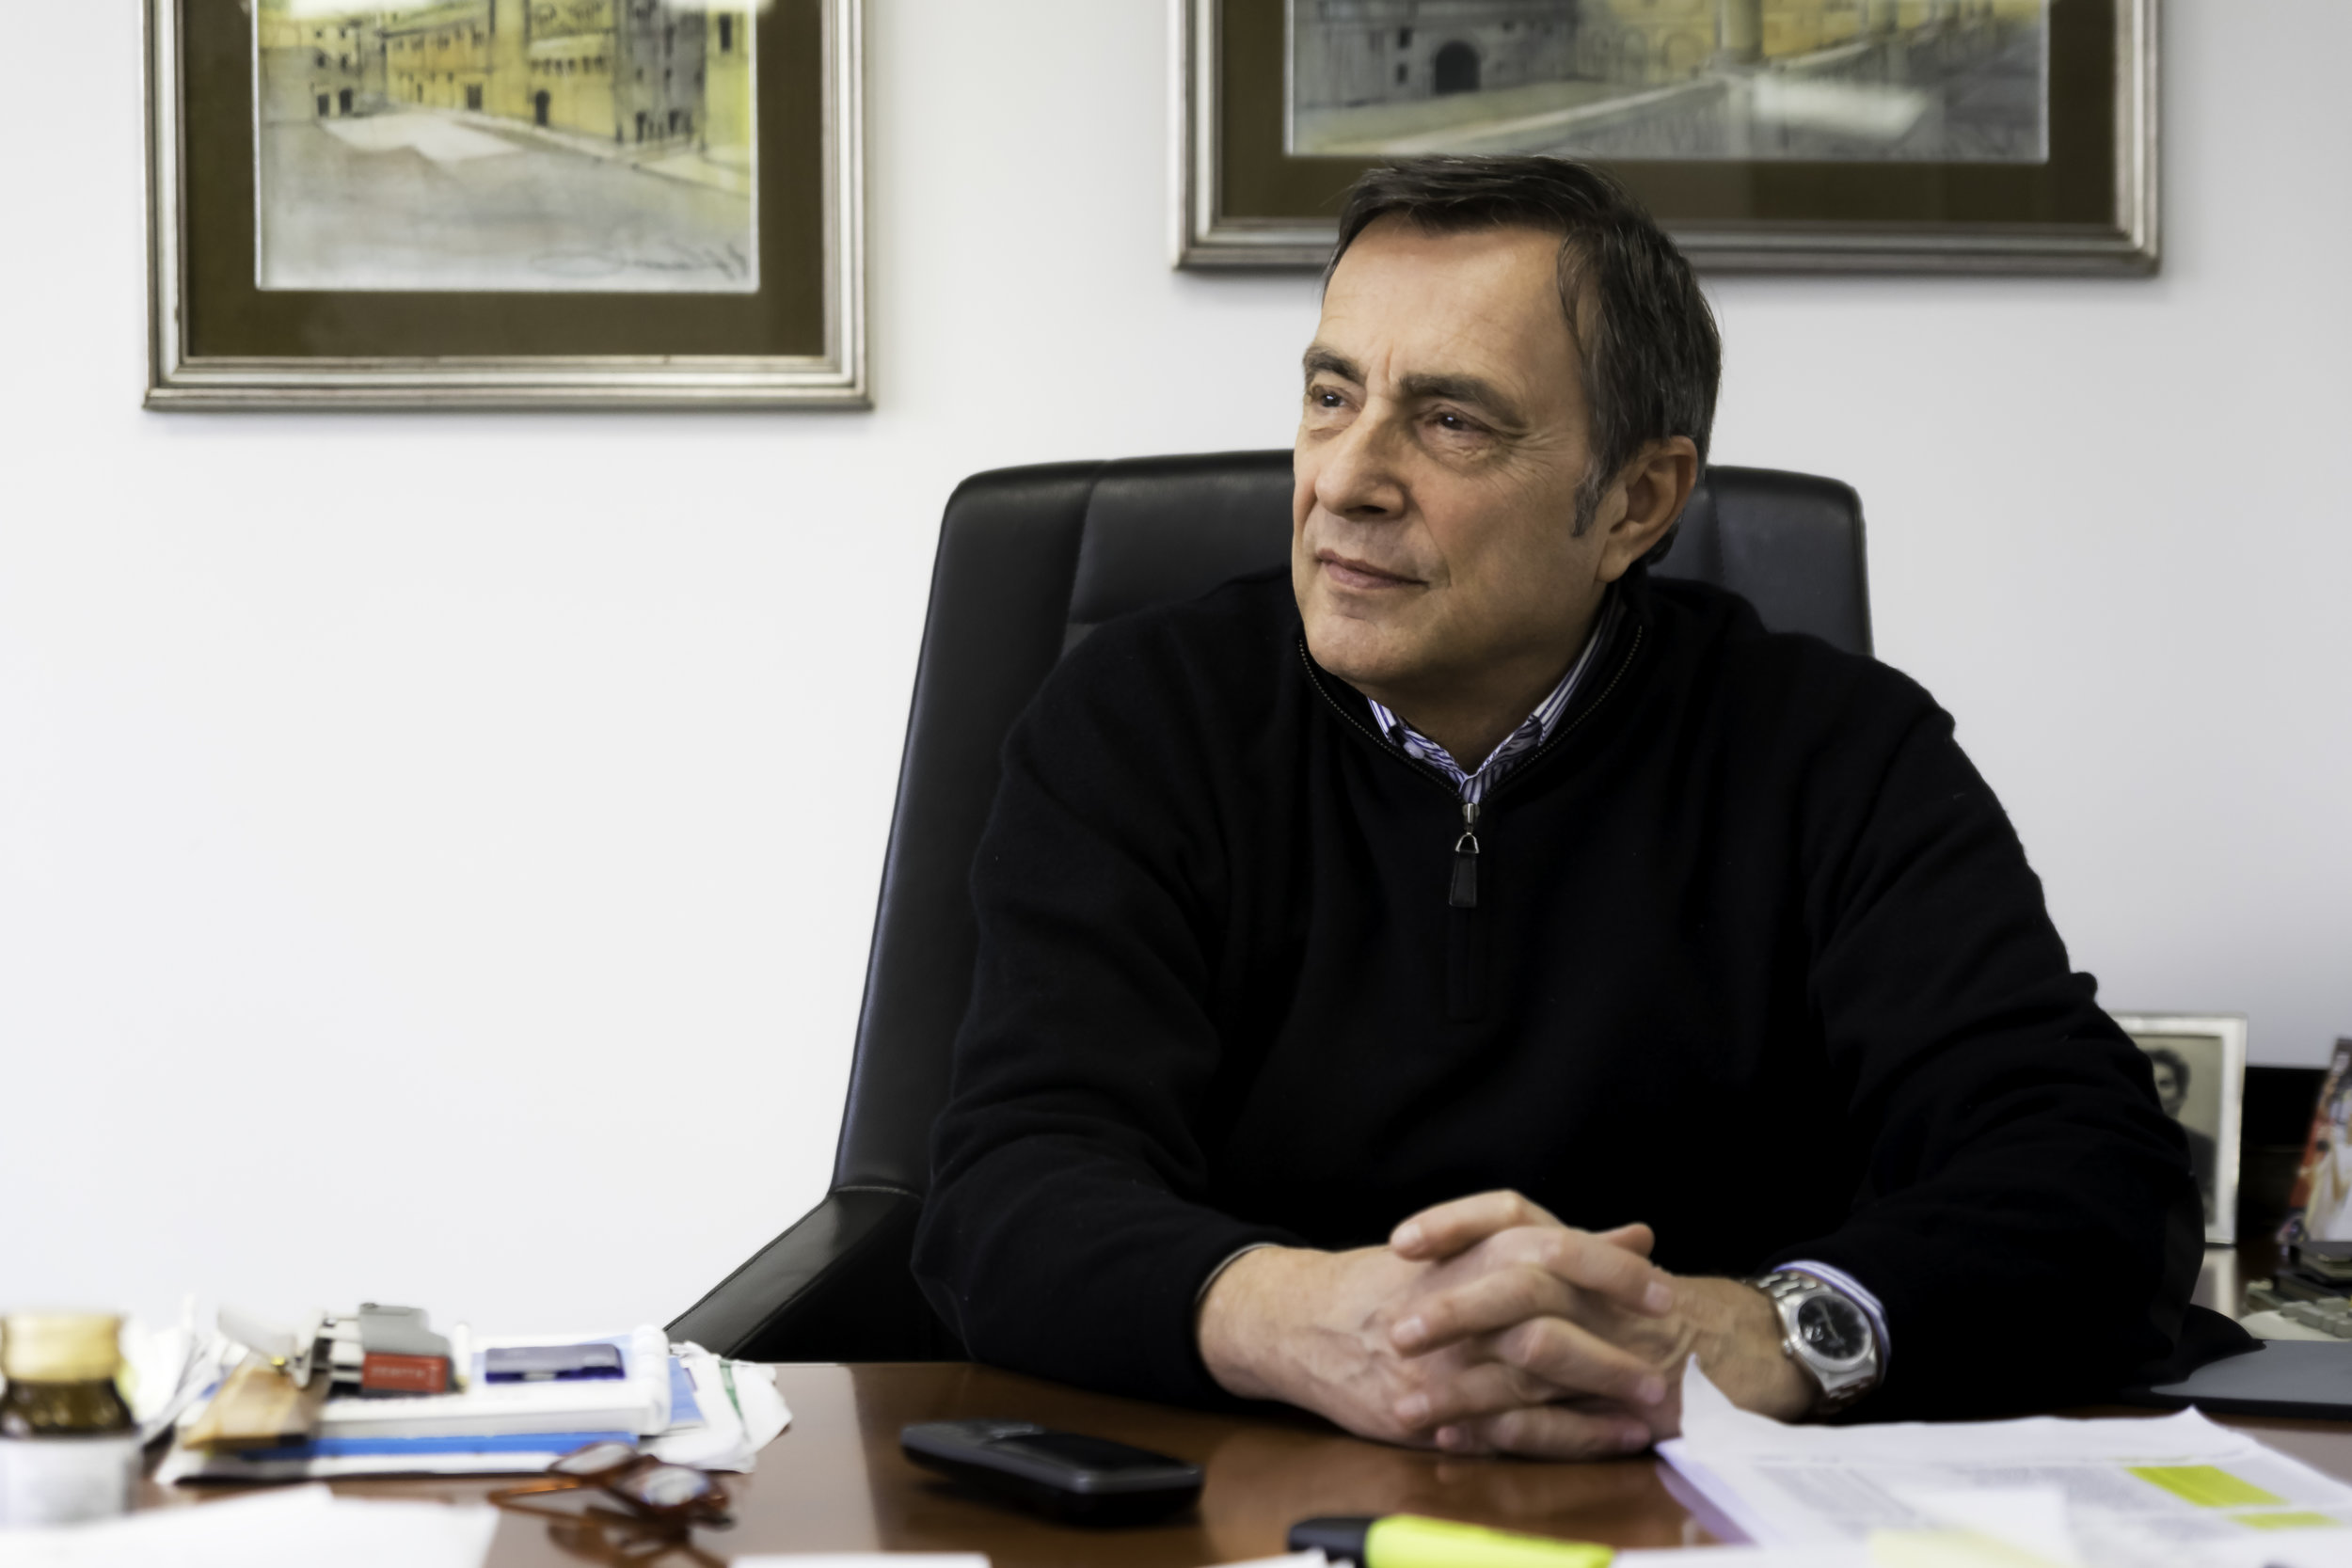 Roberto Pastore, owner of Vetrodomus